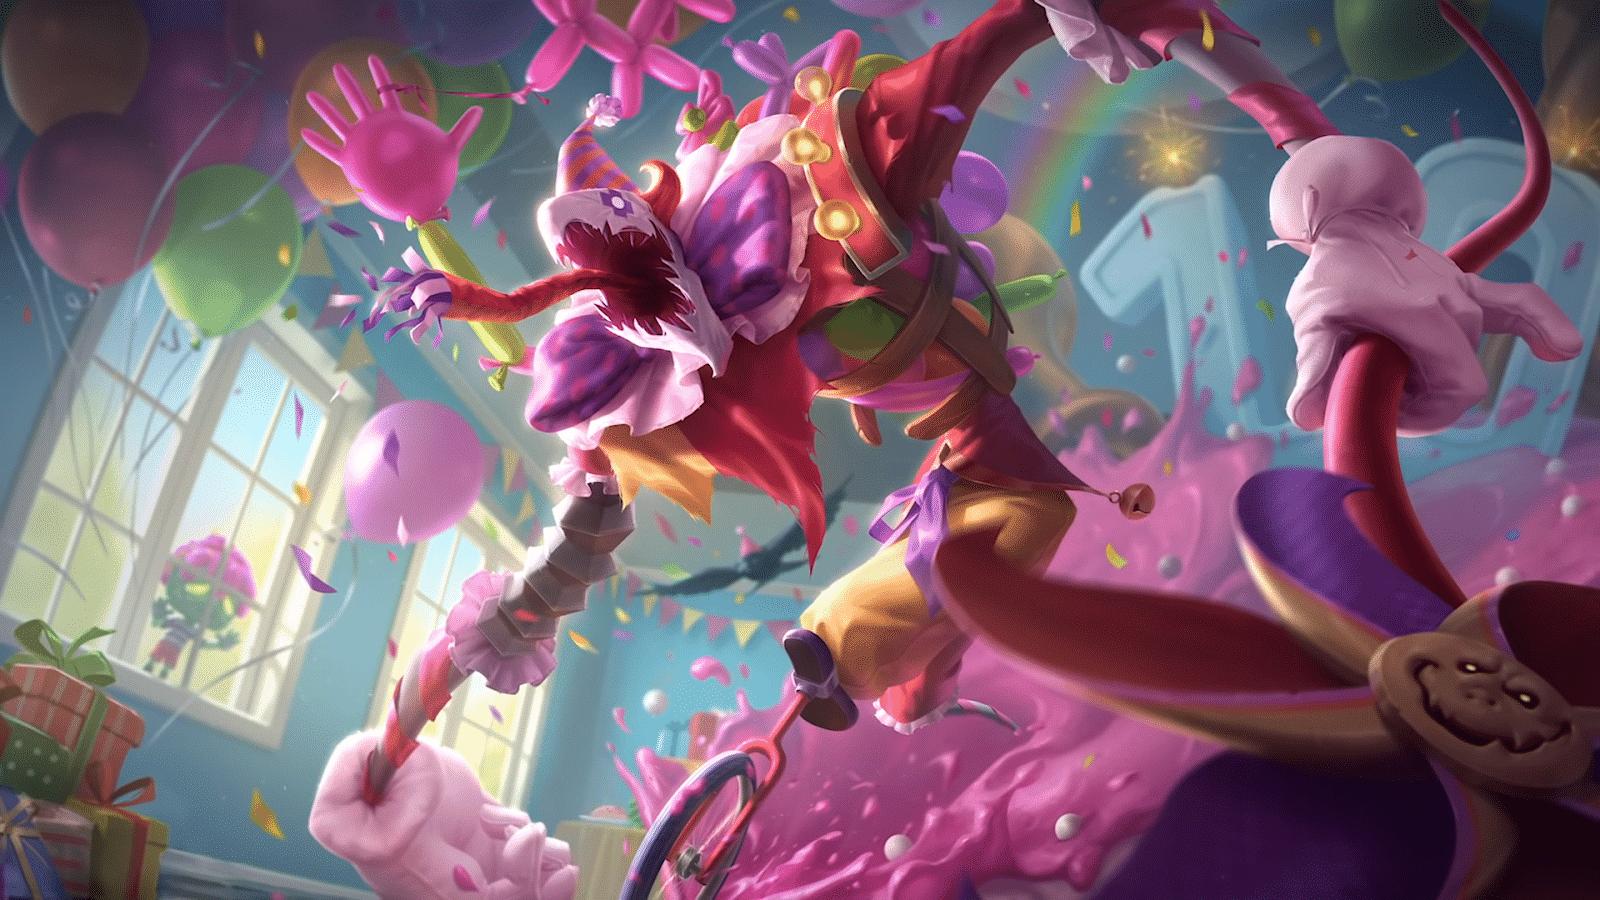 lol-fiddlesticks-rework-splash-art-surprise-party